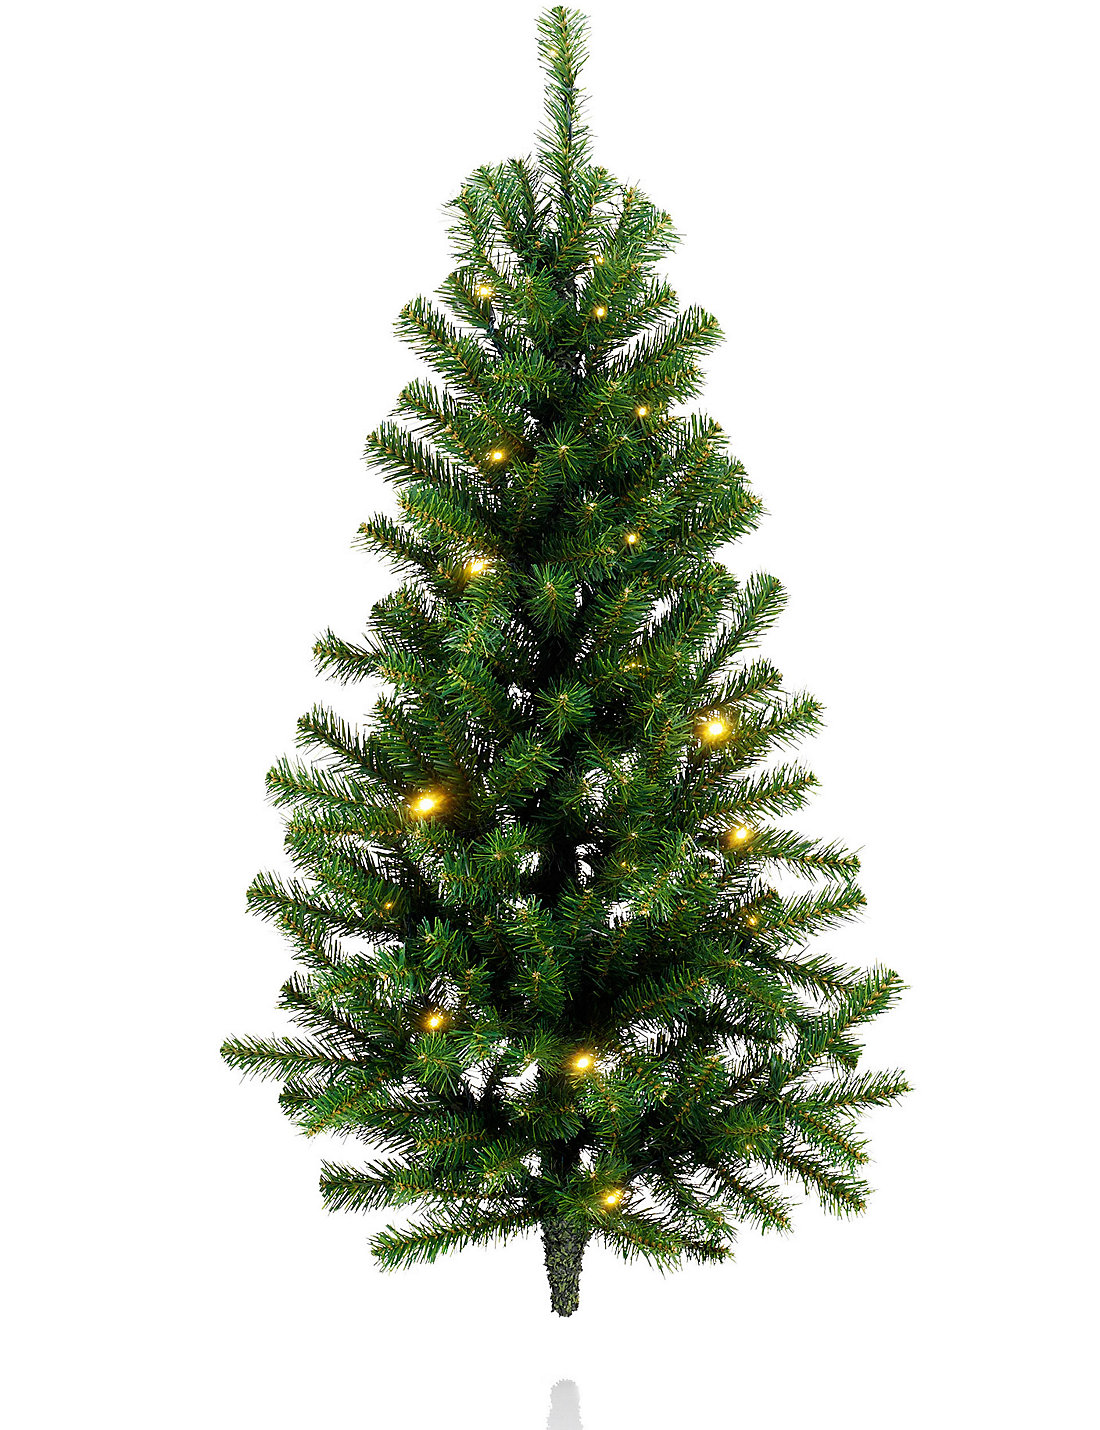 3ft pre lit wall mounted tree - Wall Mounted Christmas Tree